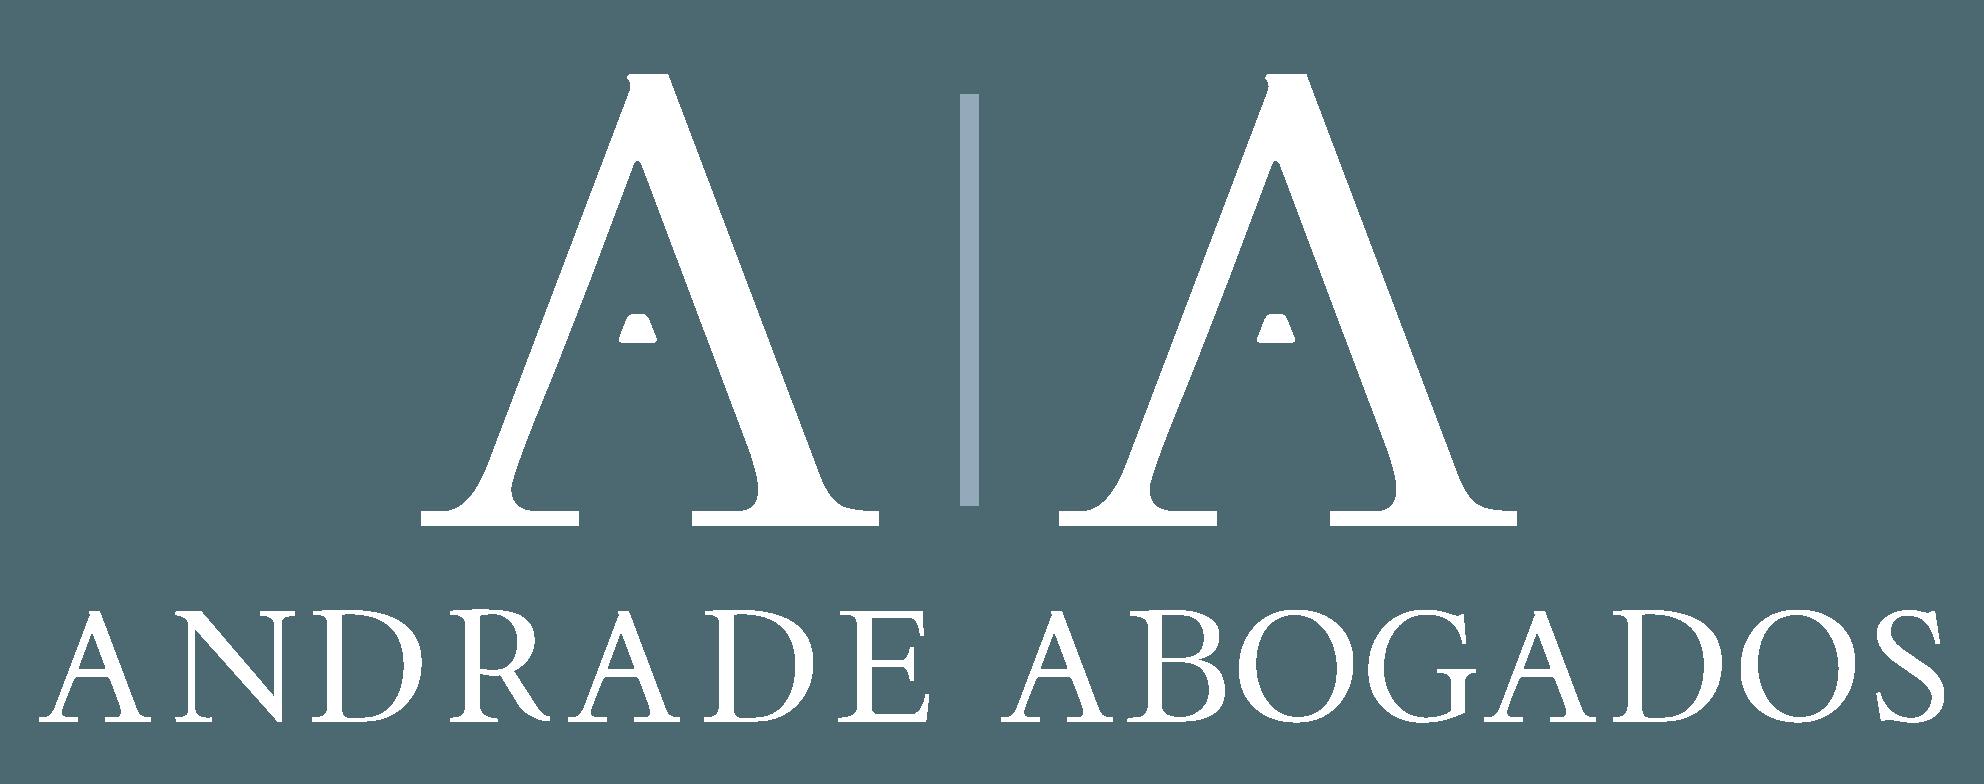 ANDRADE ABOGADOS